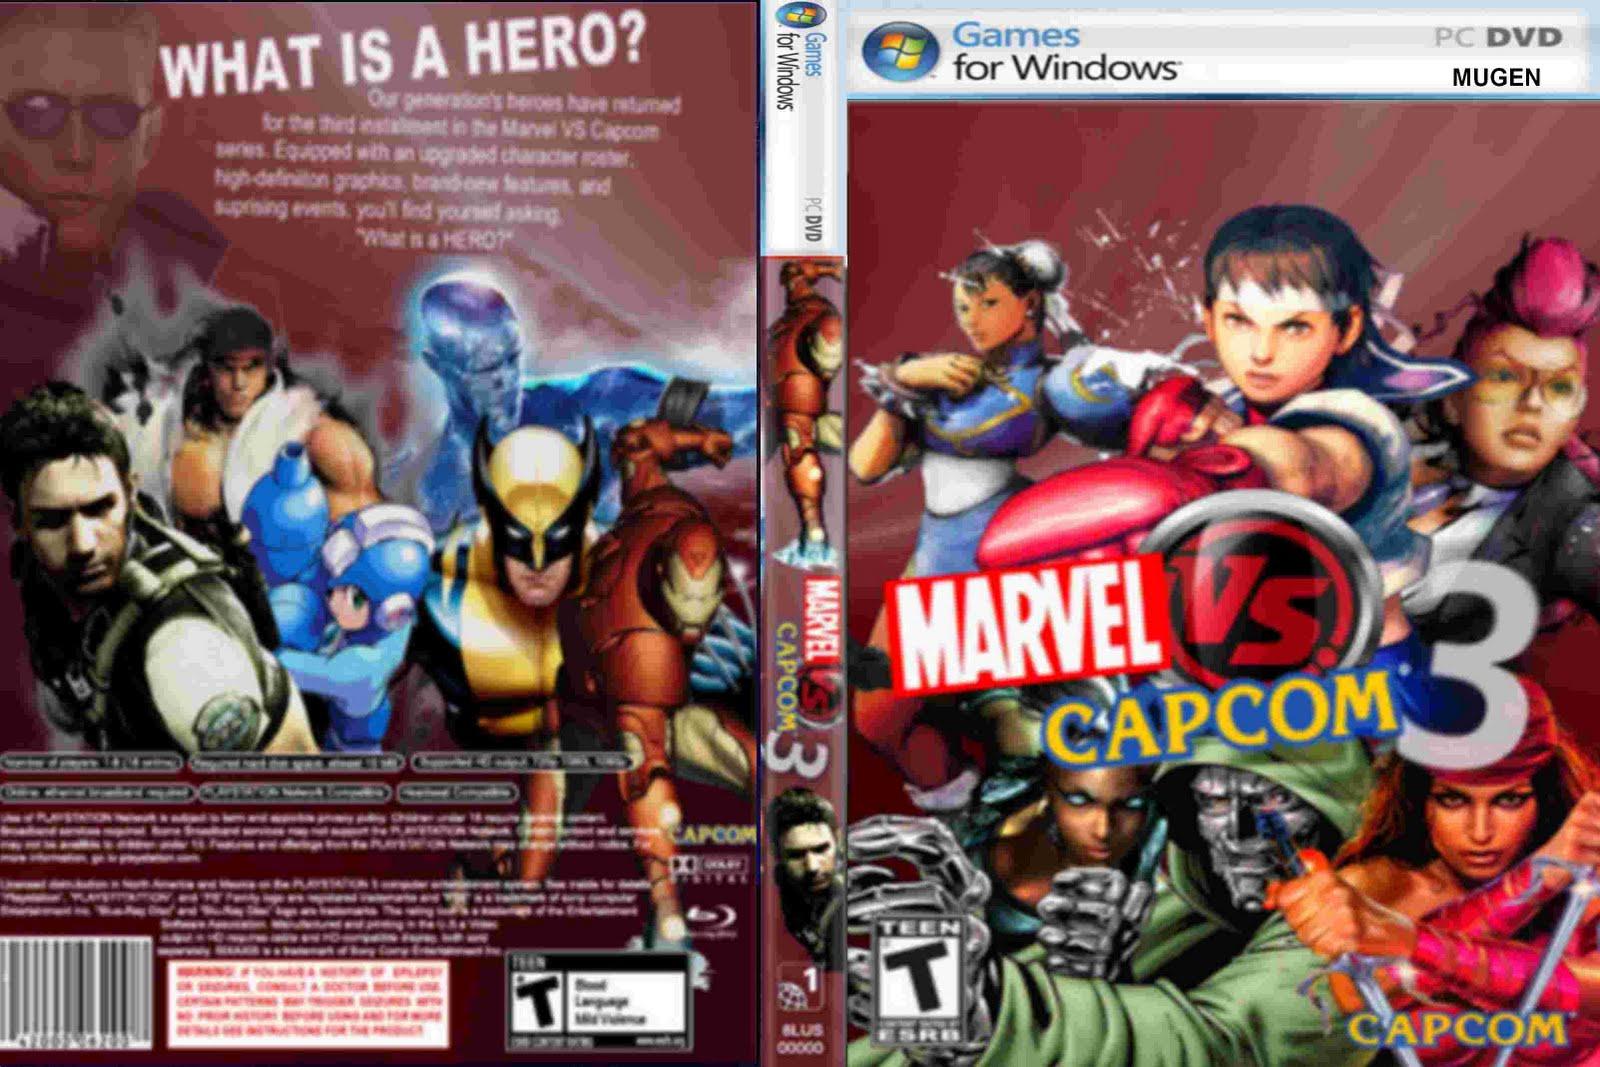 Marvel vs capcom 2 download full mugen games mediazonealfat.